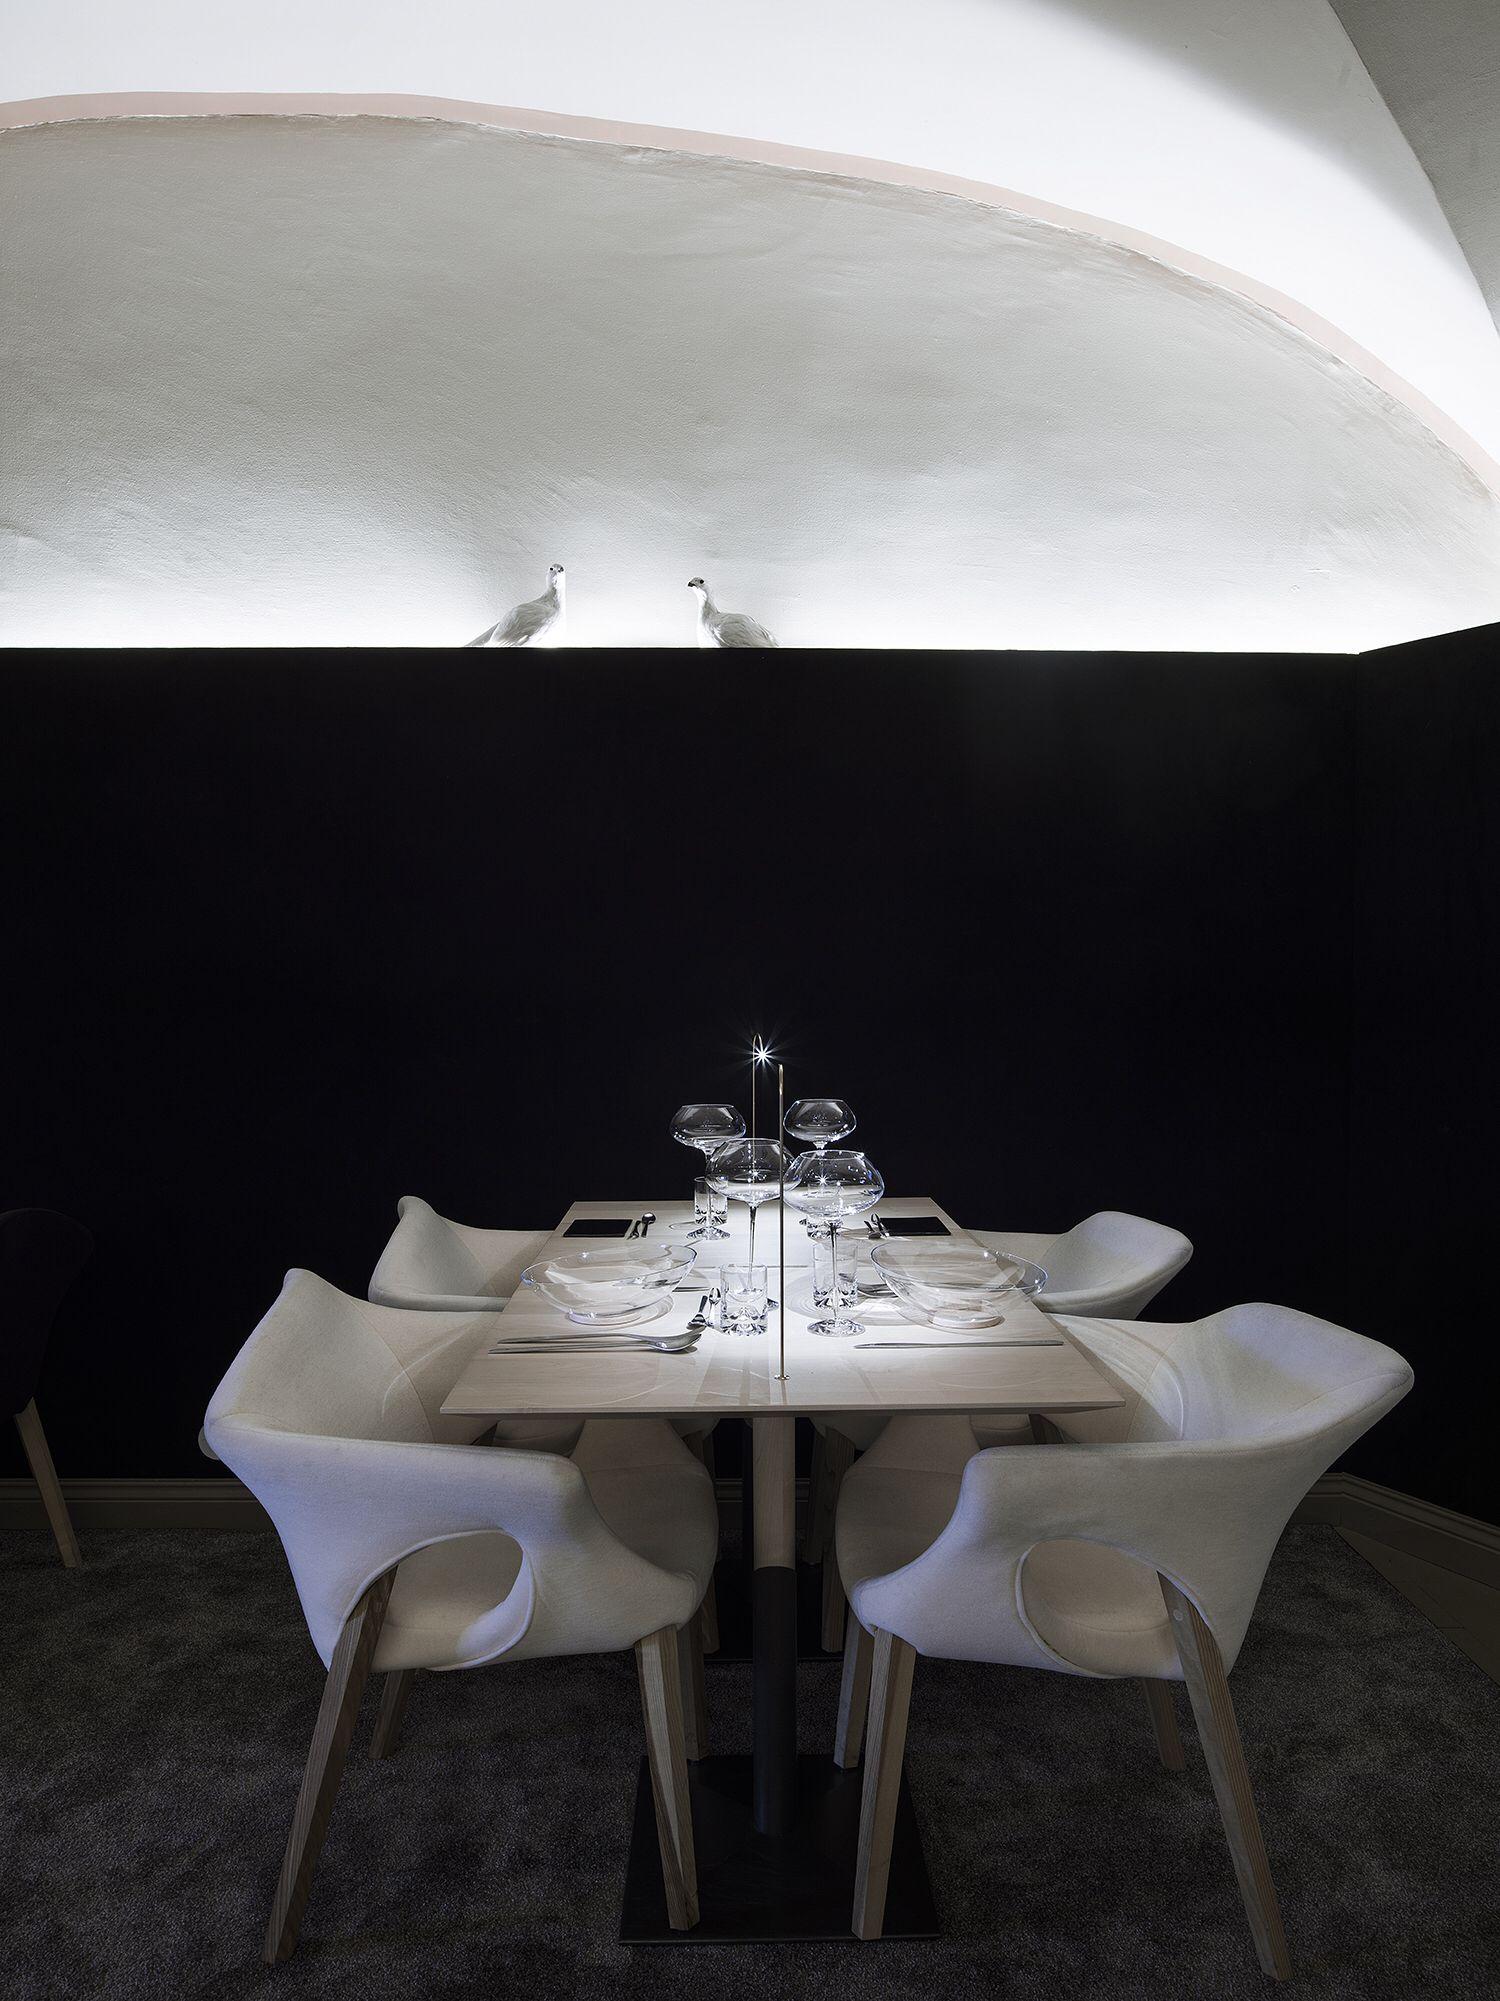 Finnjävel restaurant designed by Ateljé Sotamaa. Ptarmigan table. Photo by Kimmo Syväri. #ateljesotamaa #ateljésotamaa #finnjävel #finnjavel #finndining #finnishdesign #kivisotamaa #tuulisotamaa